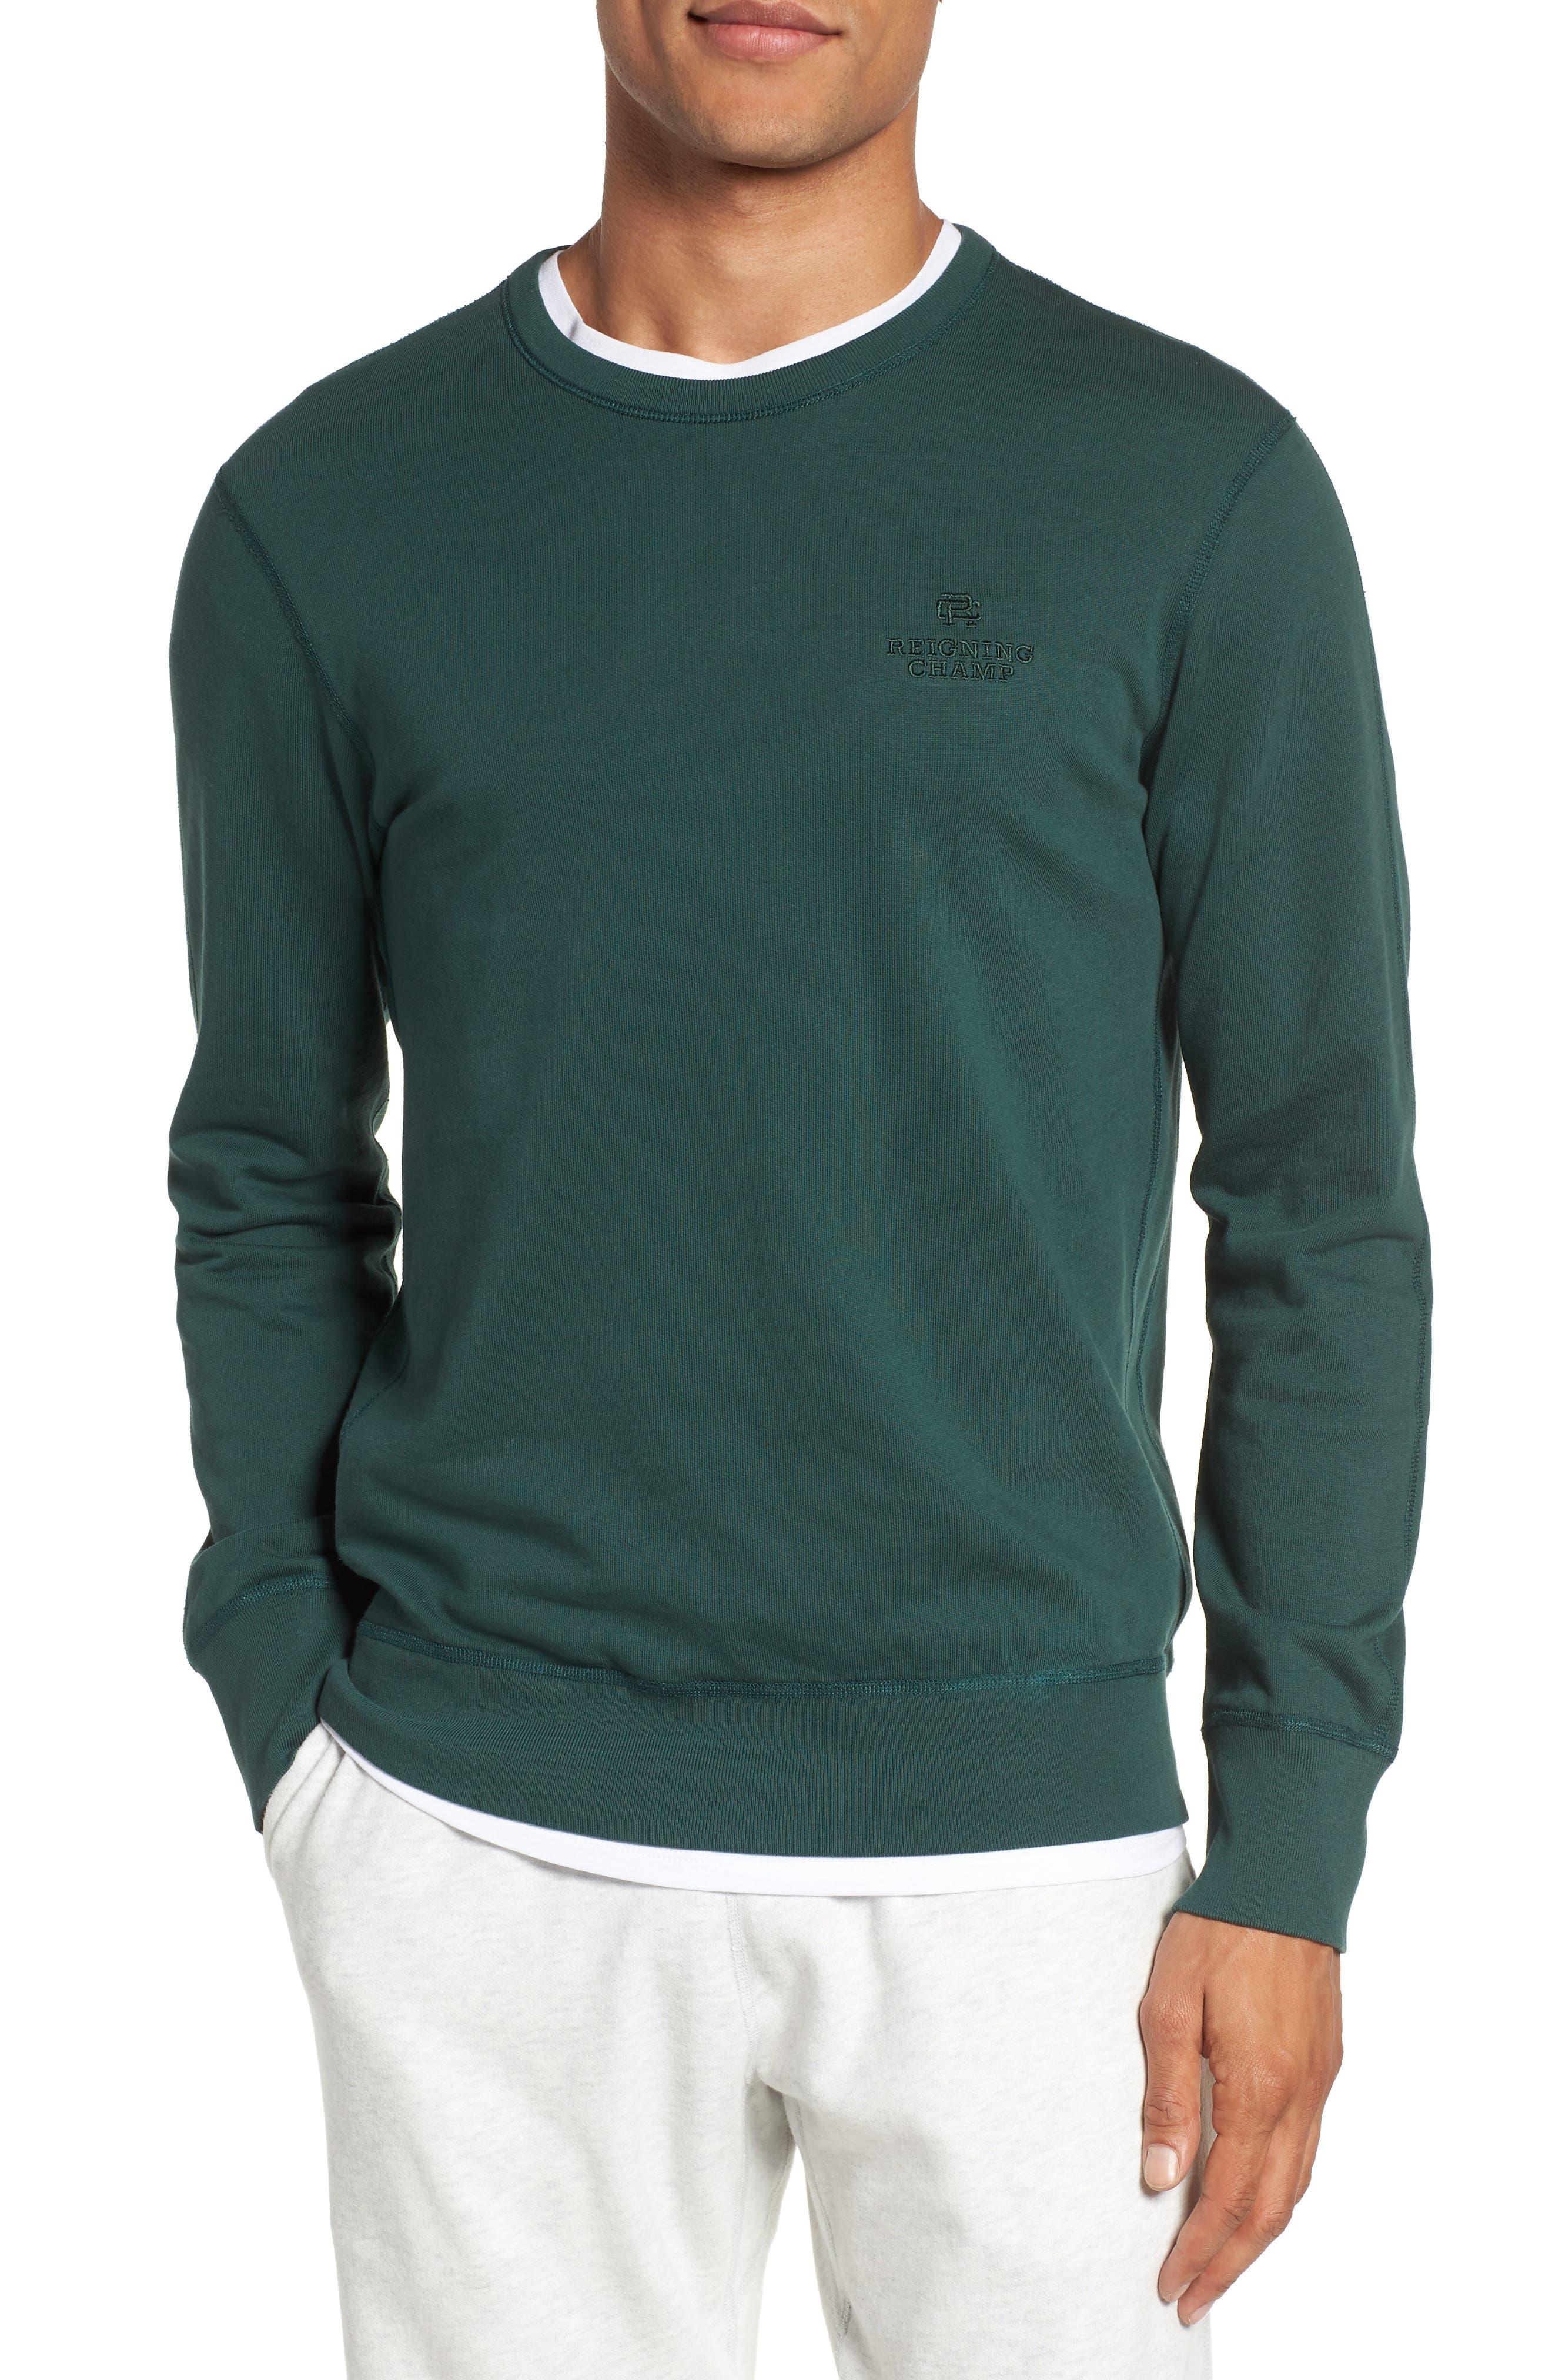 Reigning Champ Embroidered Logo Crewneck Sweatshirt